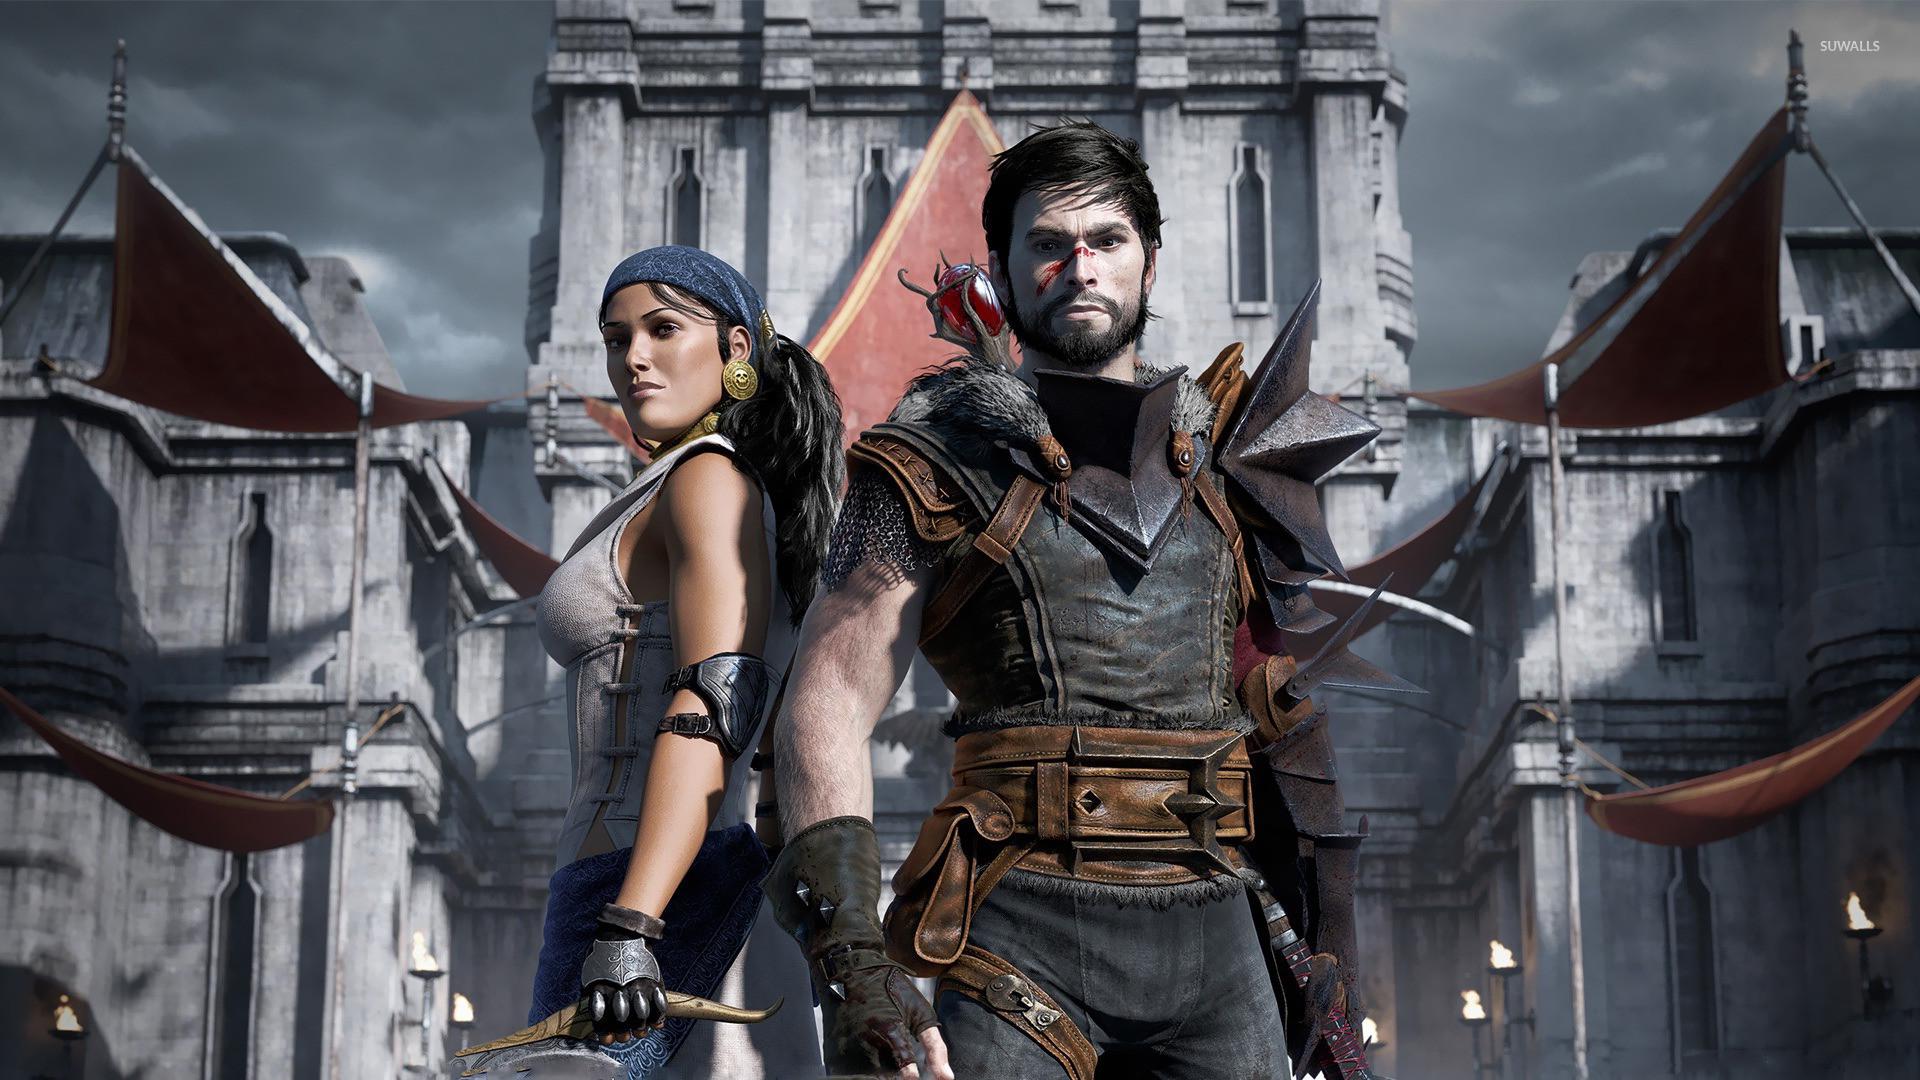 Dragon Age III: Inquisition wallpaper jpg